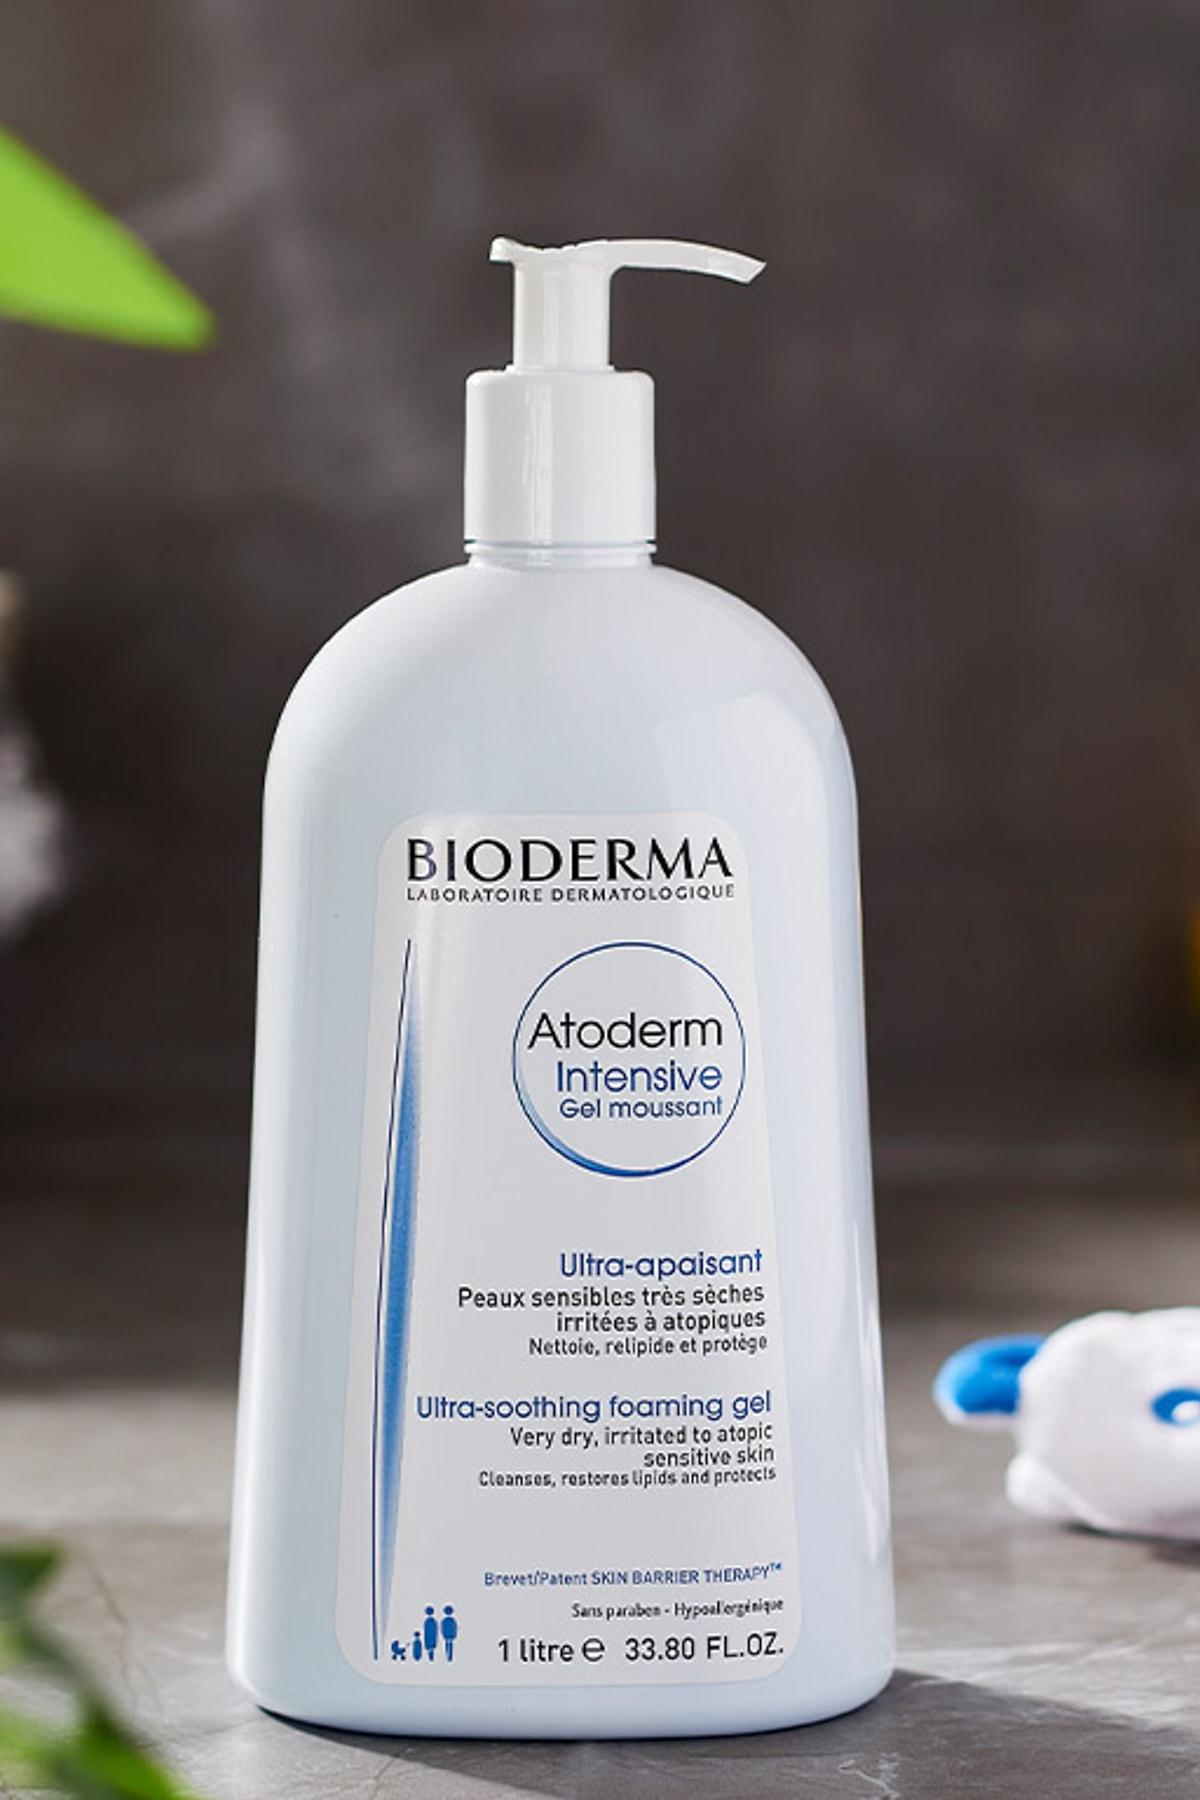 Bioderma Atoderm Intensive Foaming Gel 1 L 2